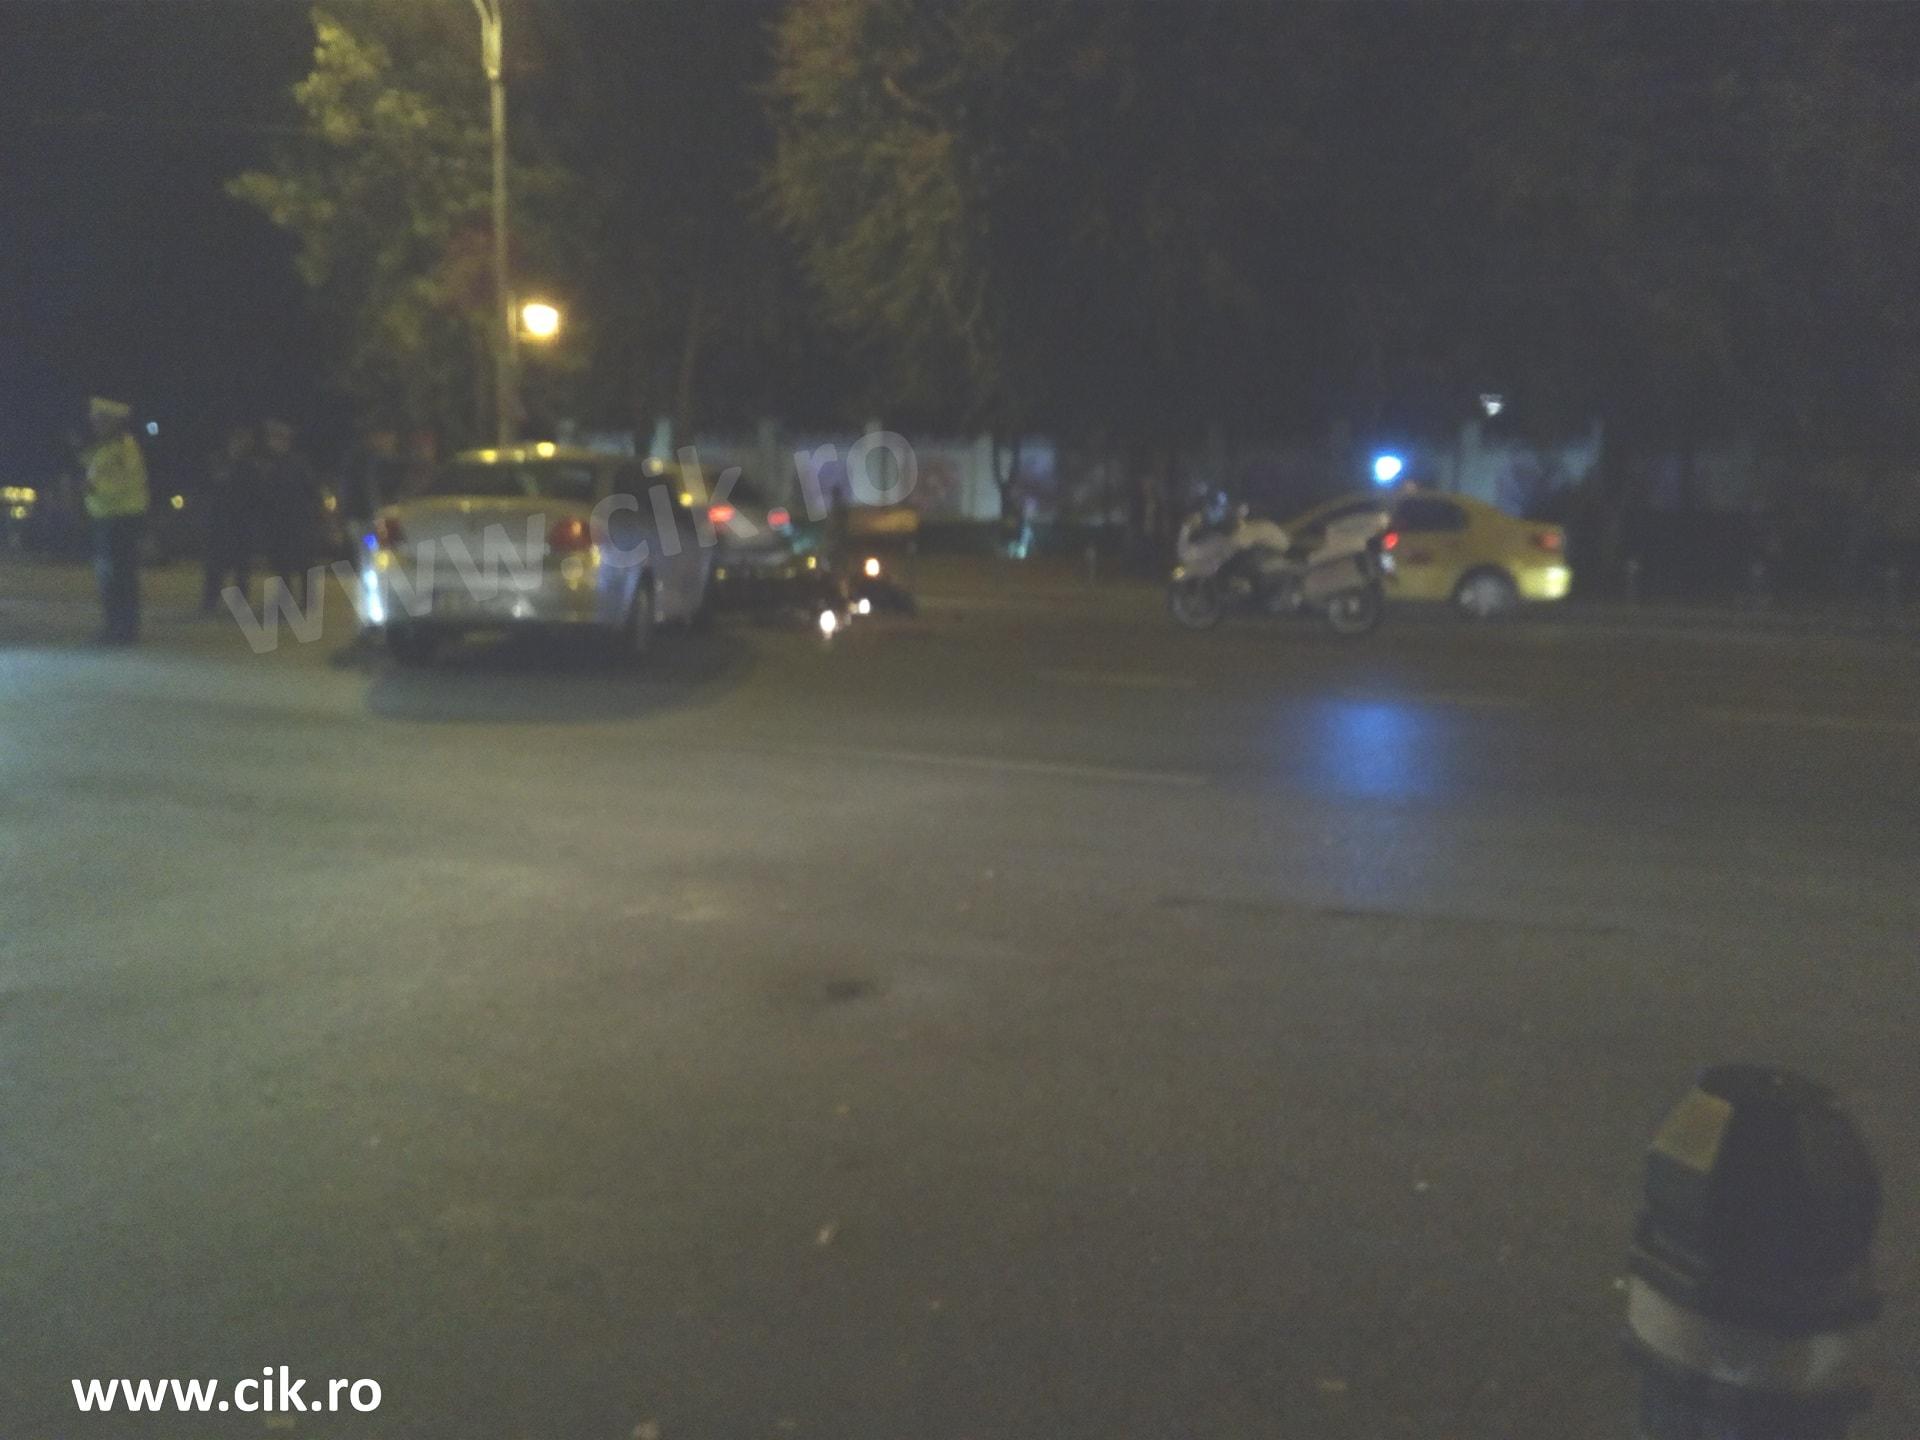 masina accident motocicleta soseaua oltenitei b 513 drm